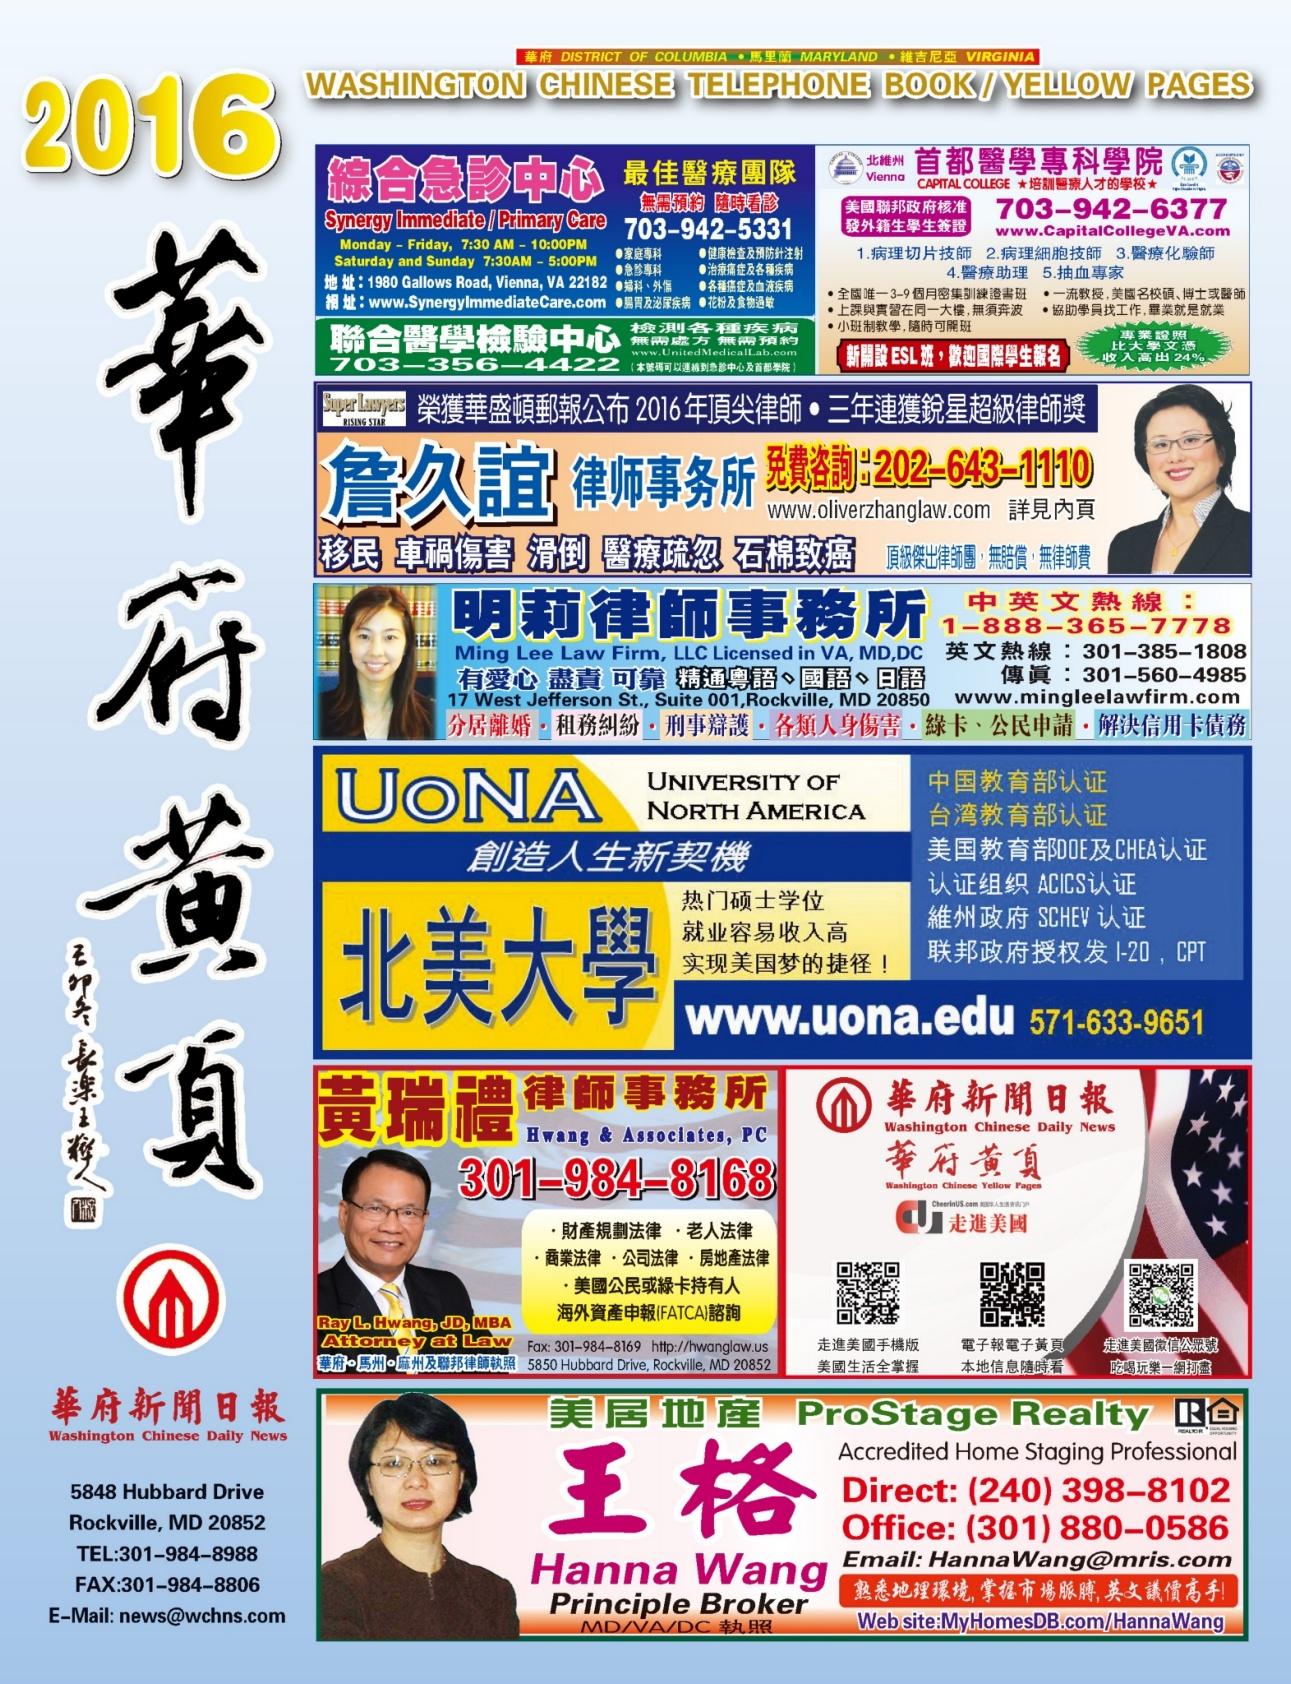 2016 WCYP 華府黃頁